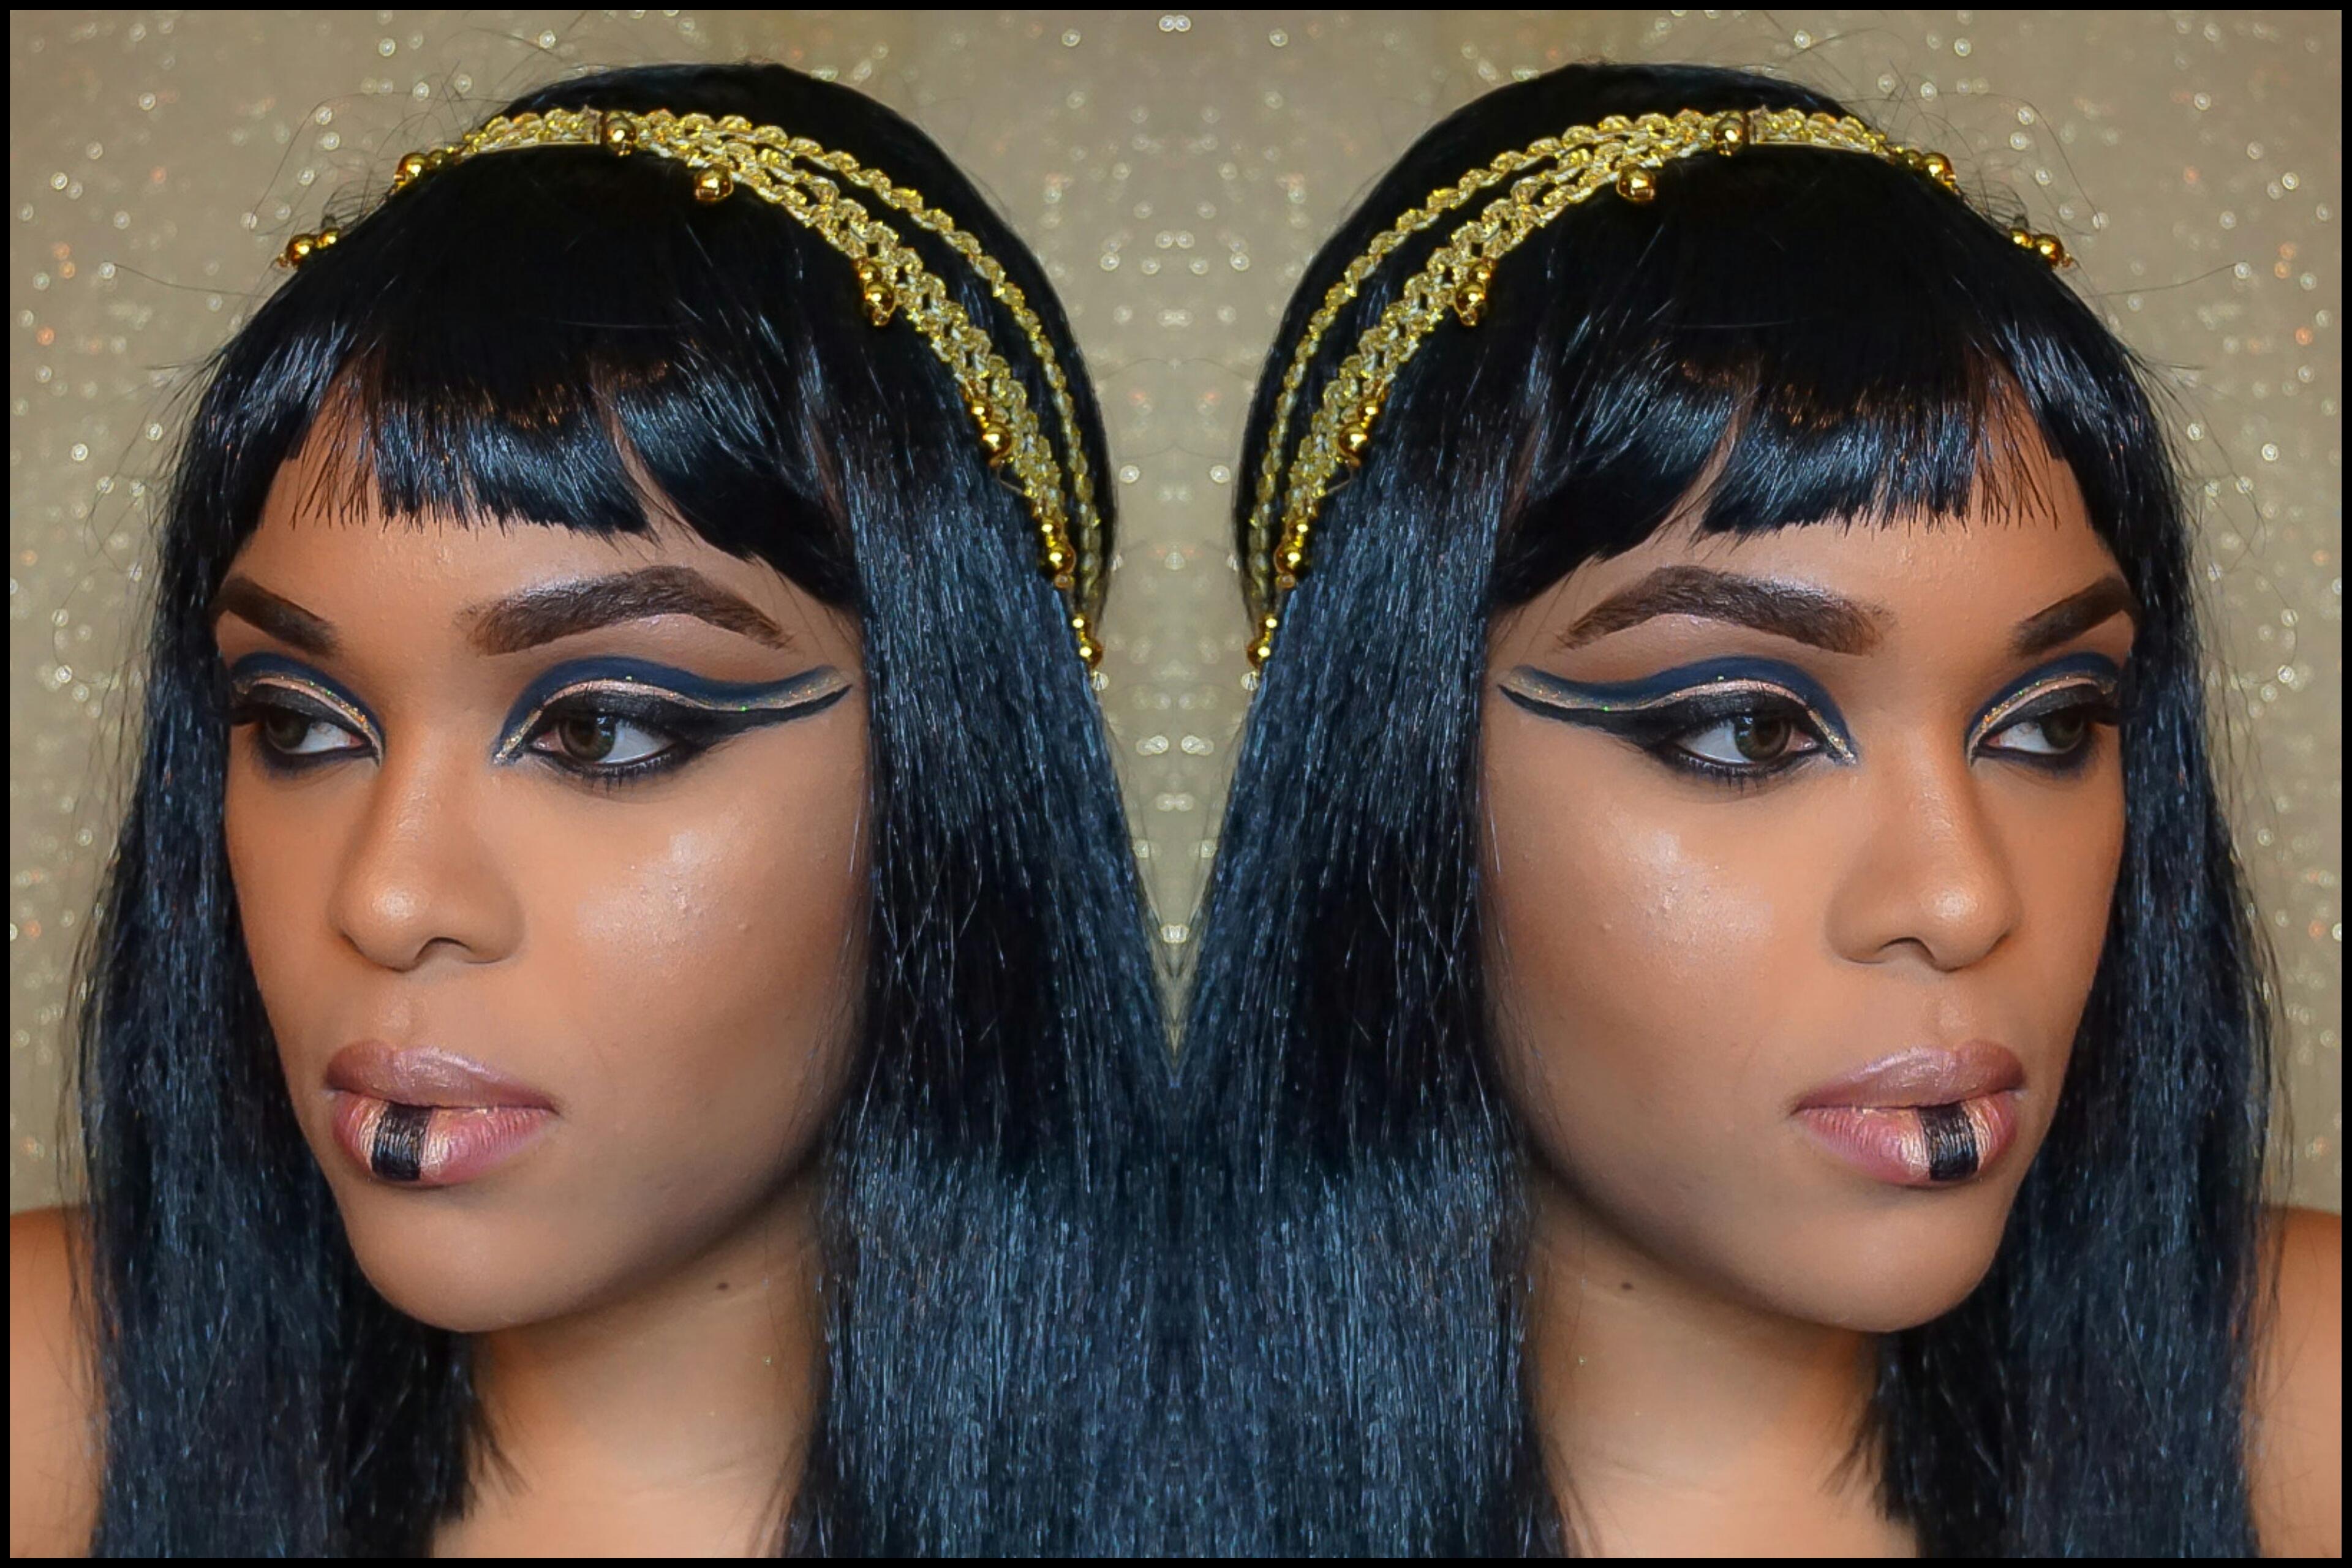 Download Goddess Halloween Makeup Pictures